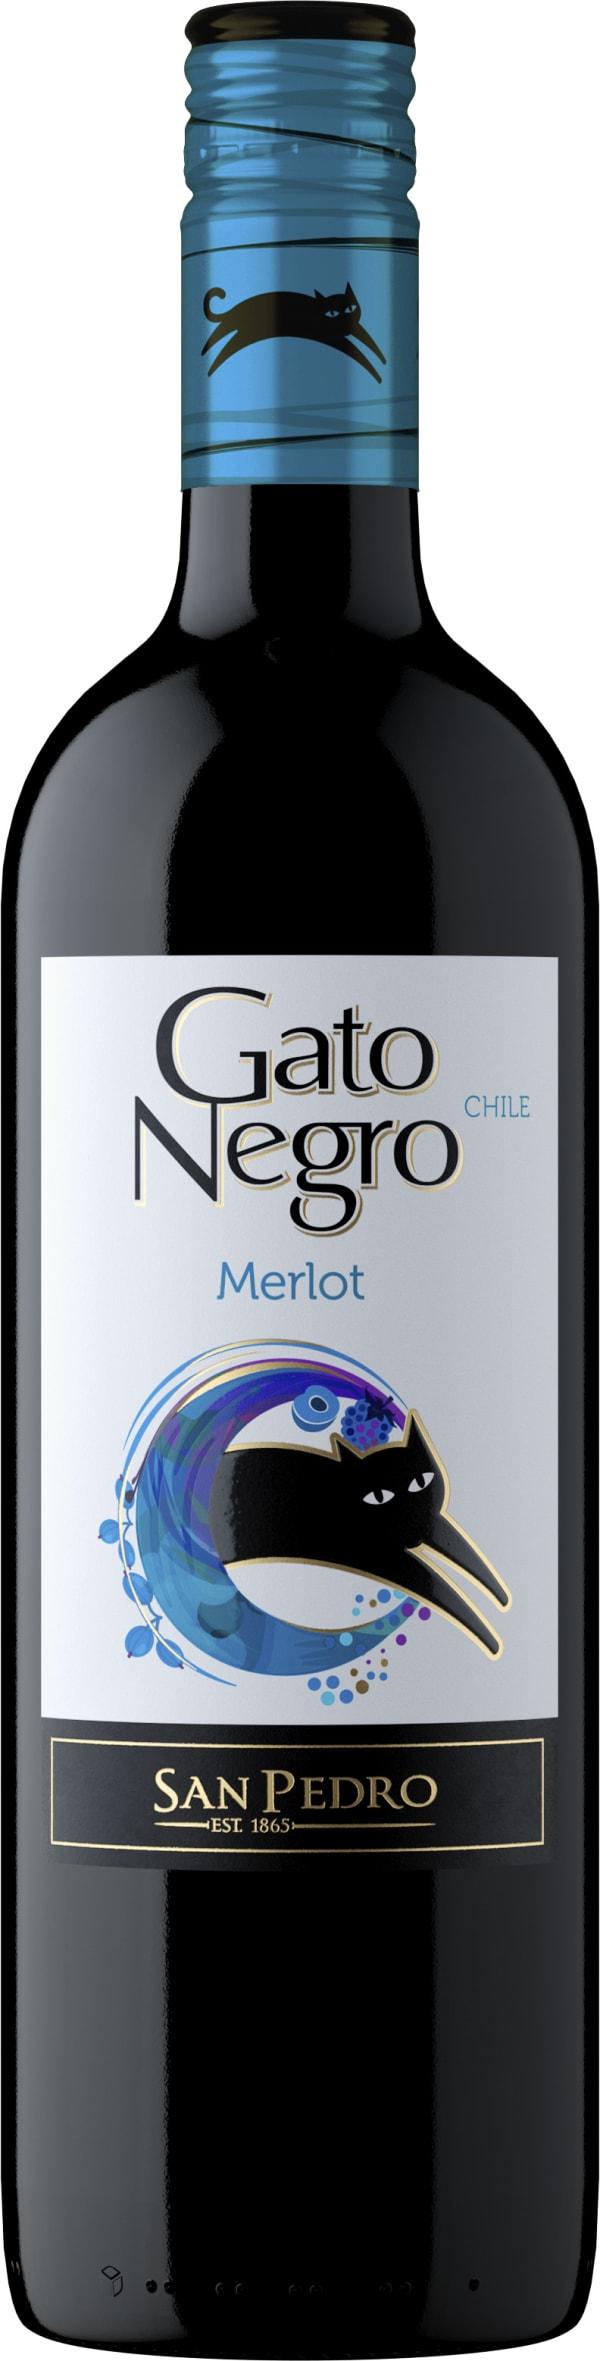 Gato Negro Merlot 2017